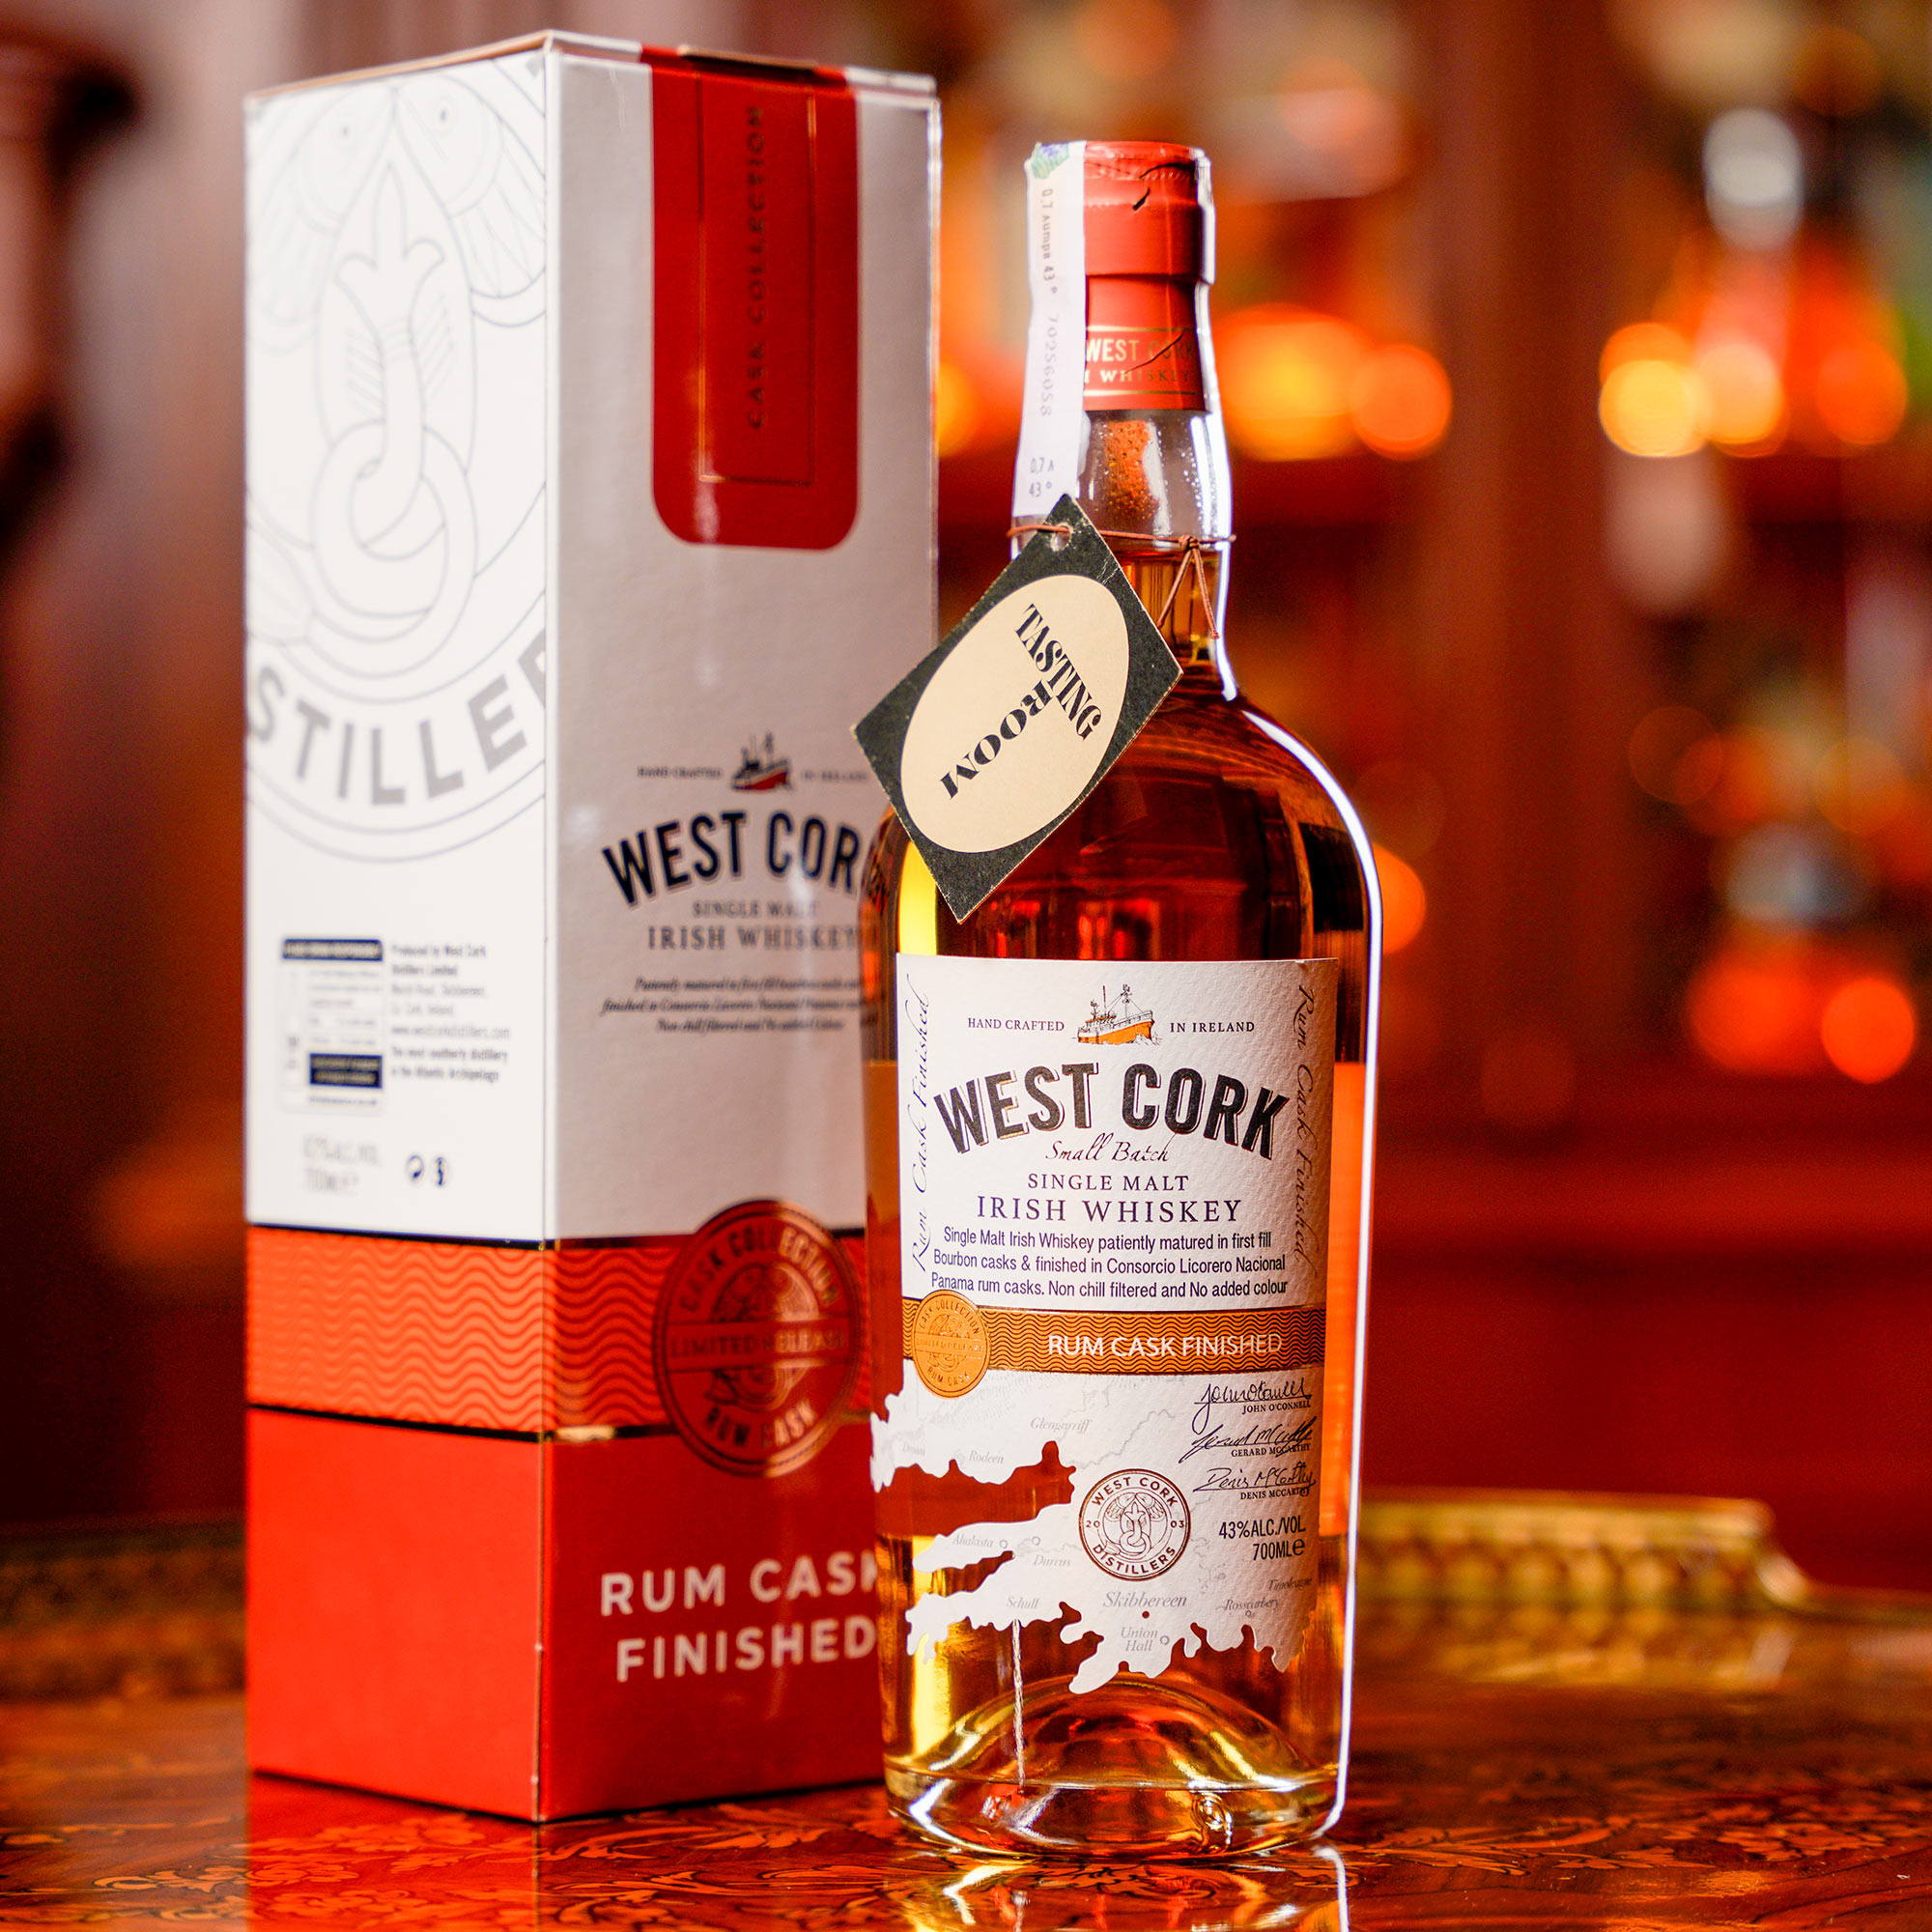 West Cork Rum Cask Finished /Уест Корк Ром Каск Финиш